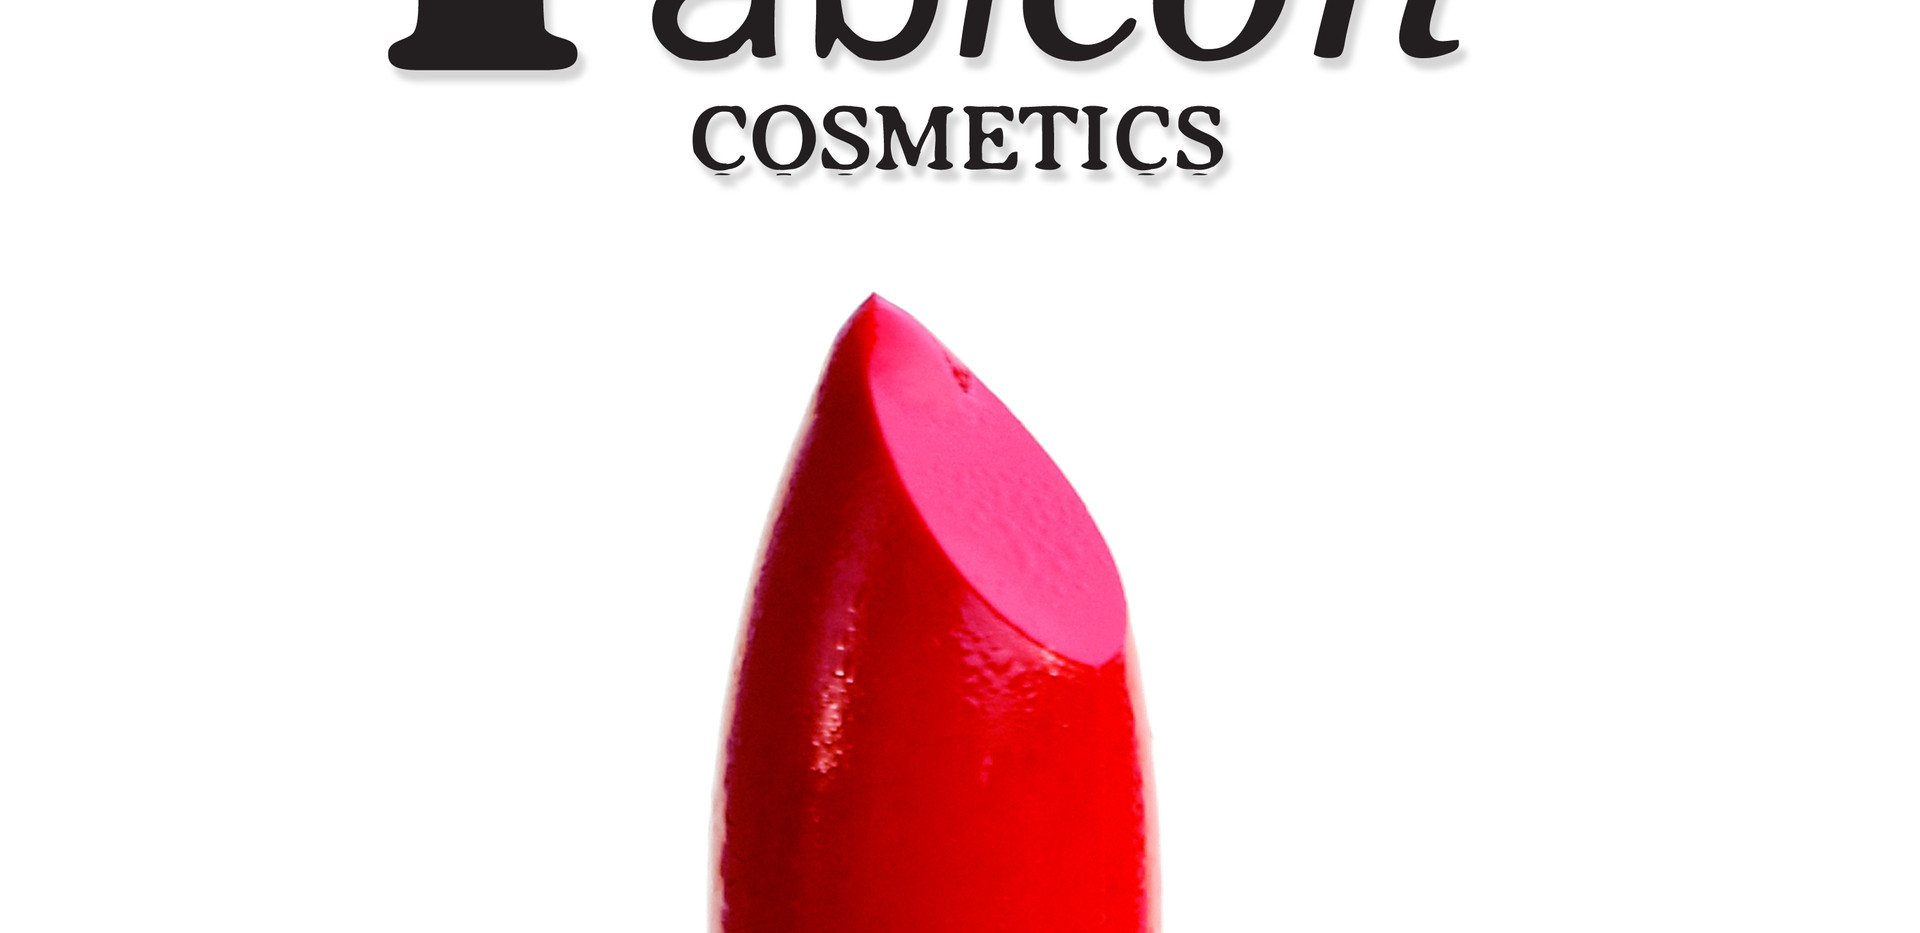 Fab Icon Cosmetics